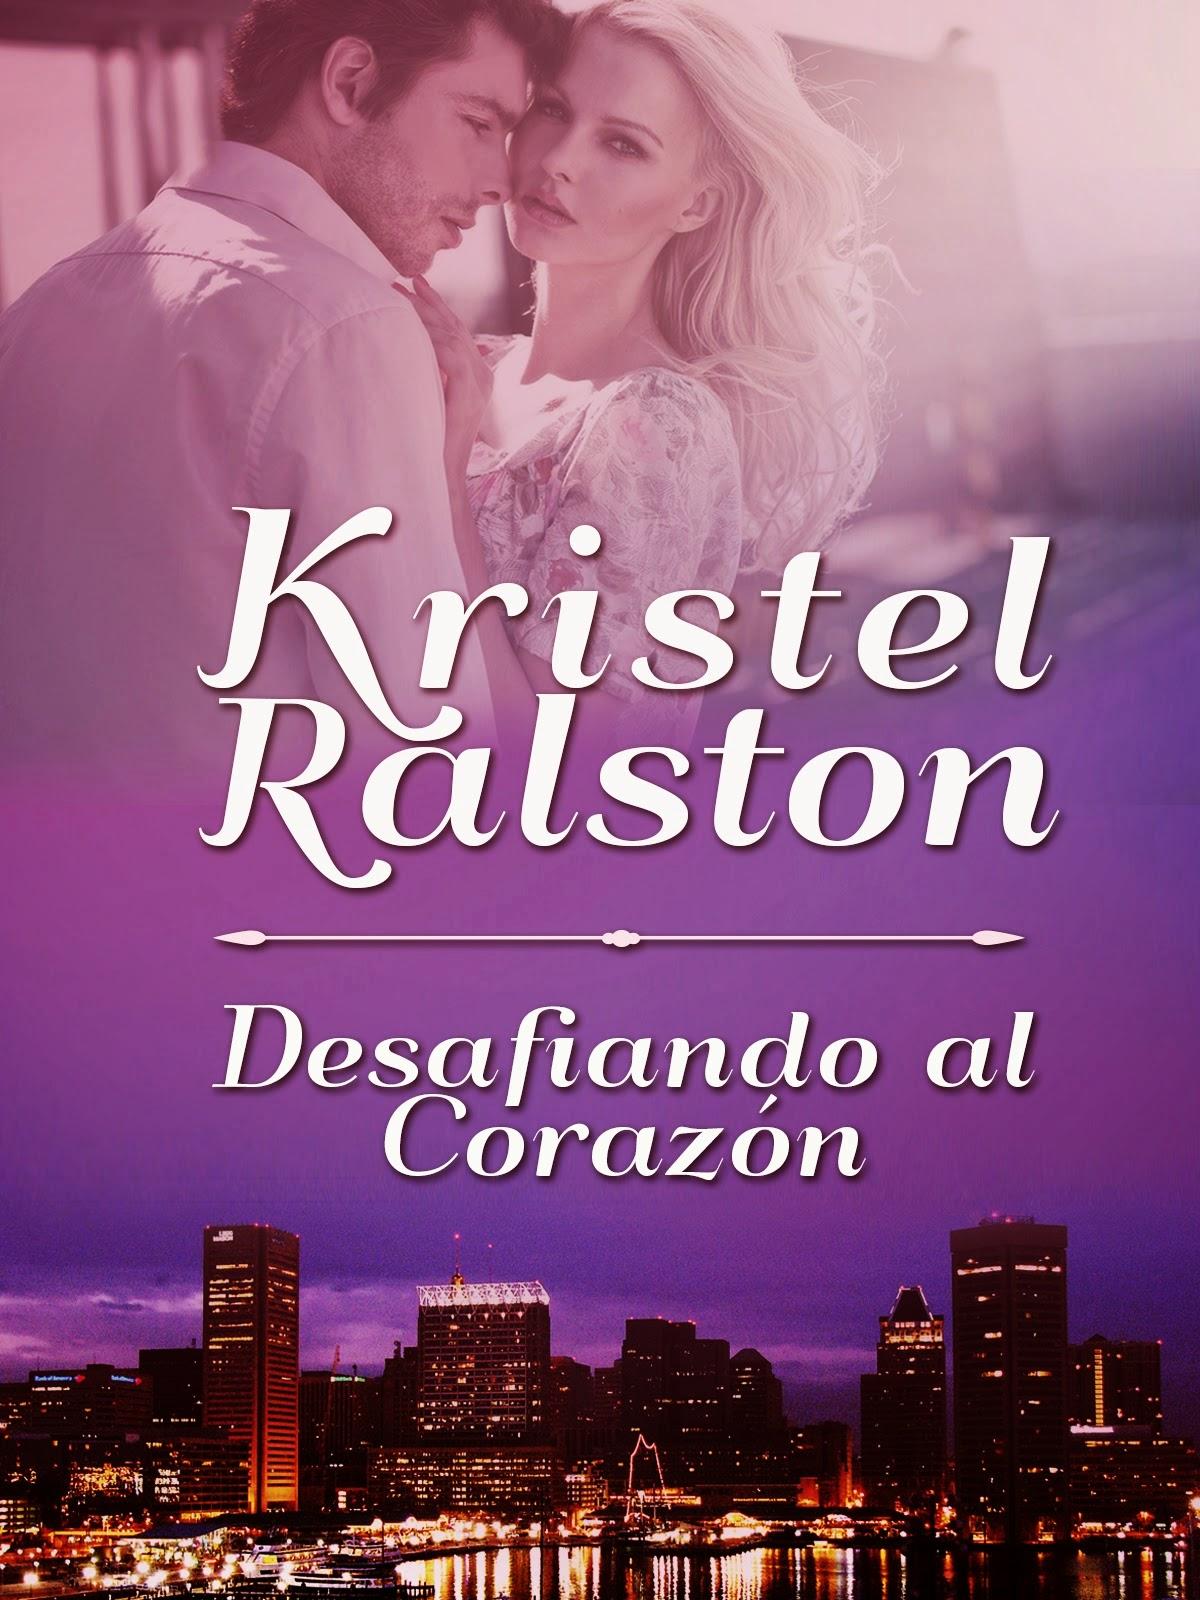 http://www.amazon.es/Desafiando-al-Coraz%C3%B3n-Kristel-Ralston-ebook/dp/B00N0D2R0K